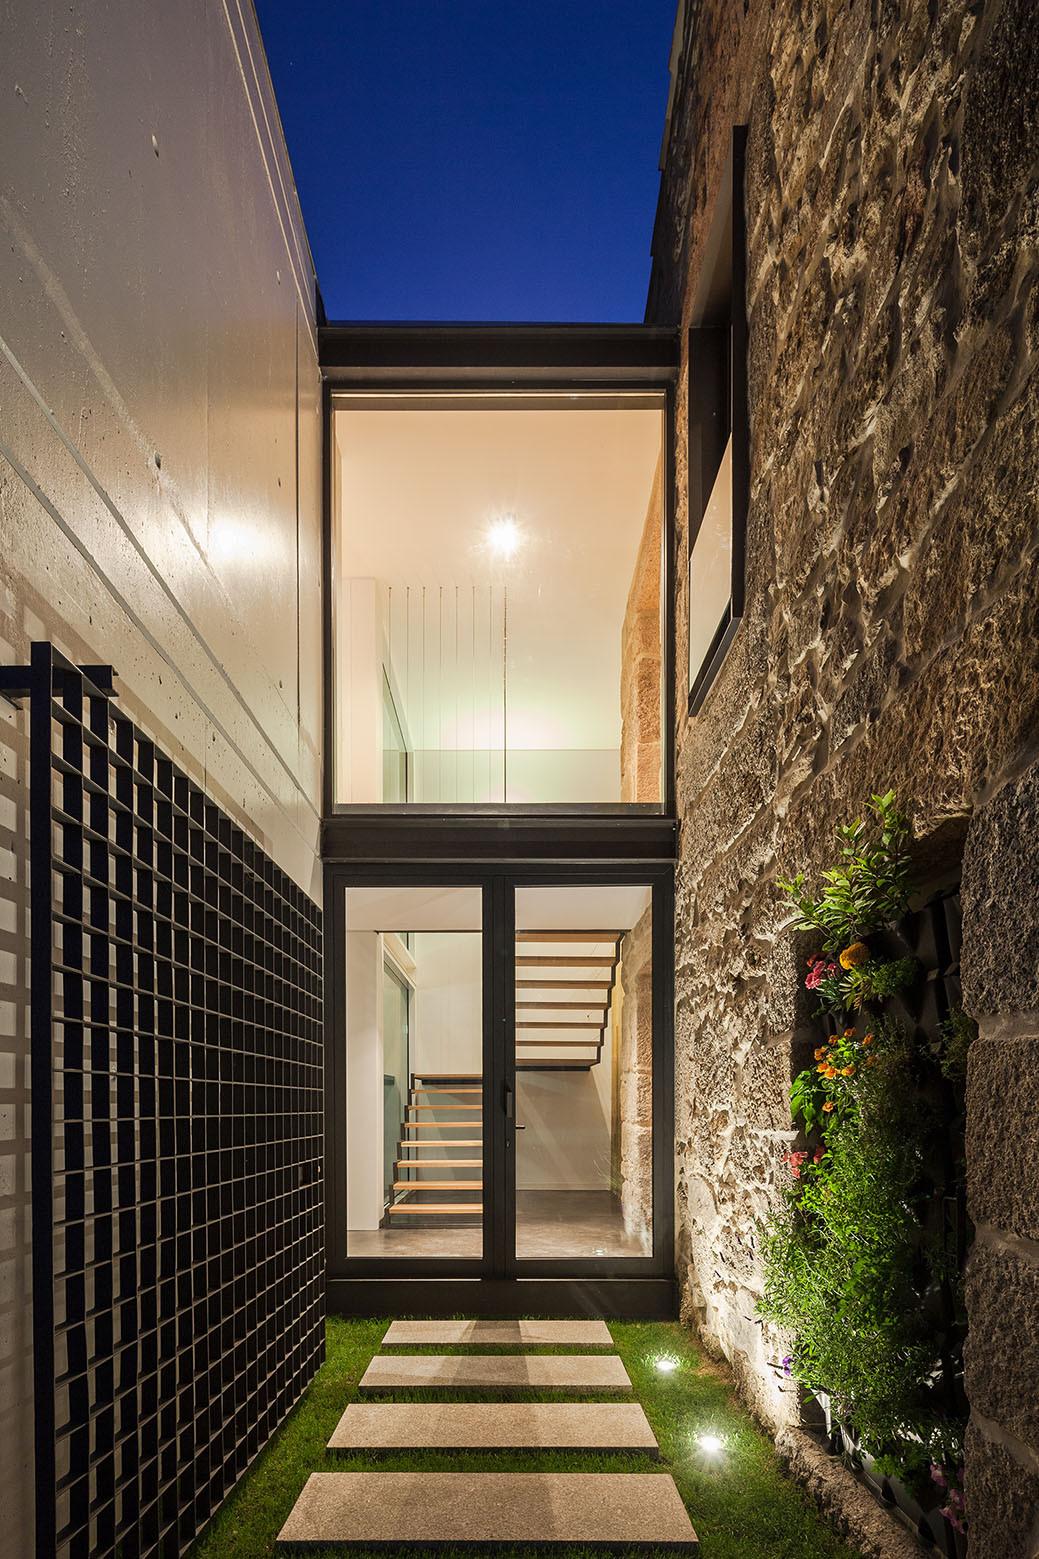 Gallery of ja house maria ines costa filipe pina 17 for Arquitectura moderna casas